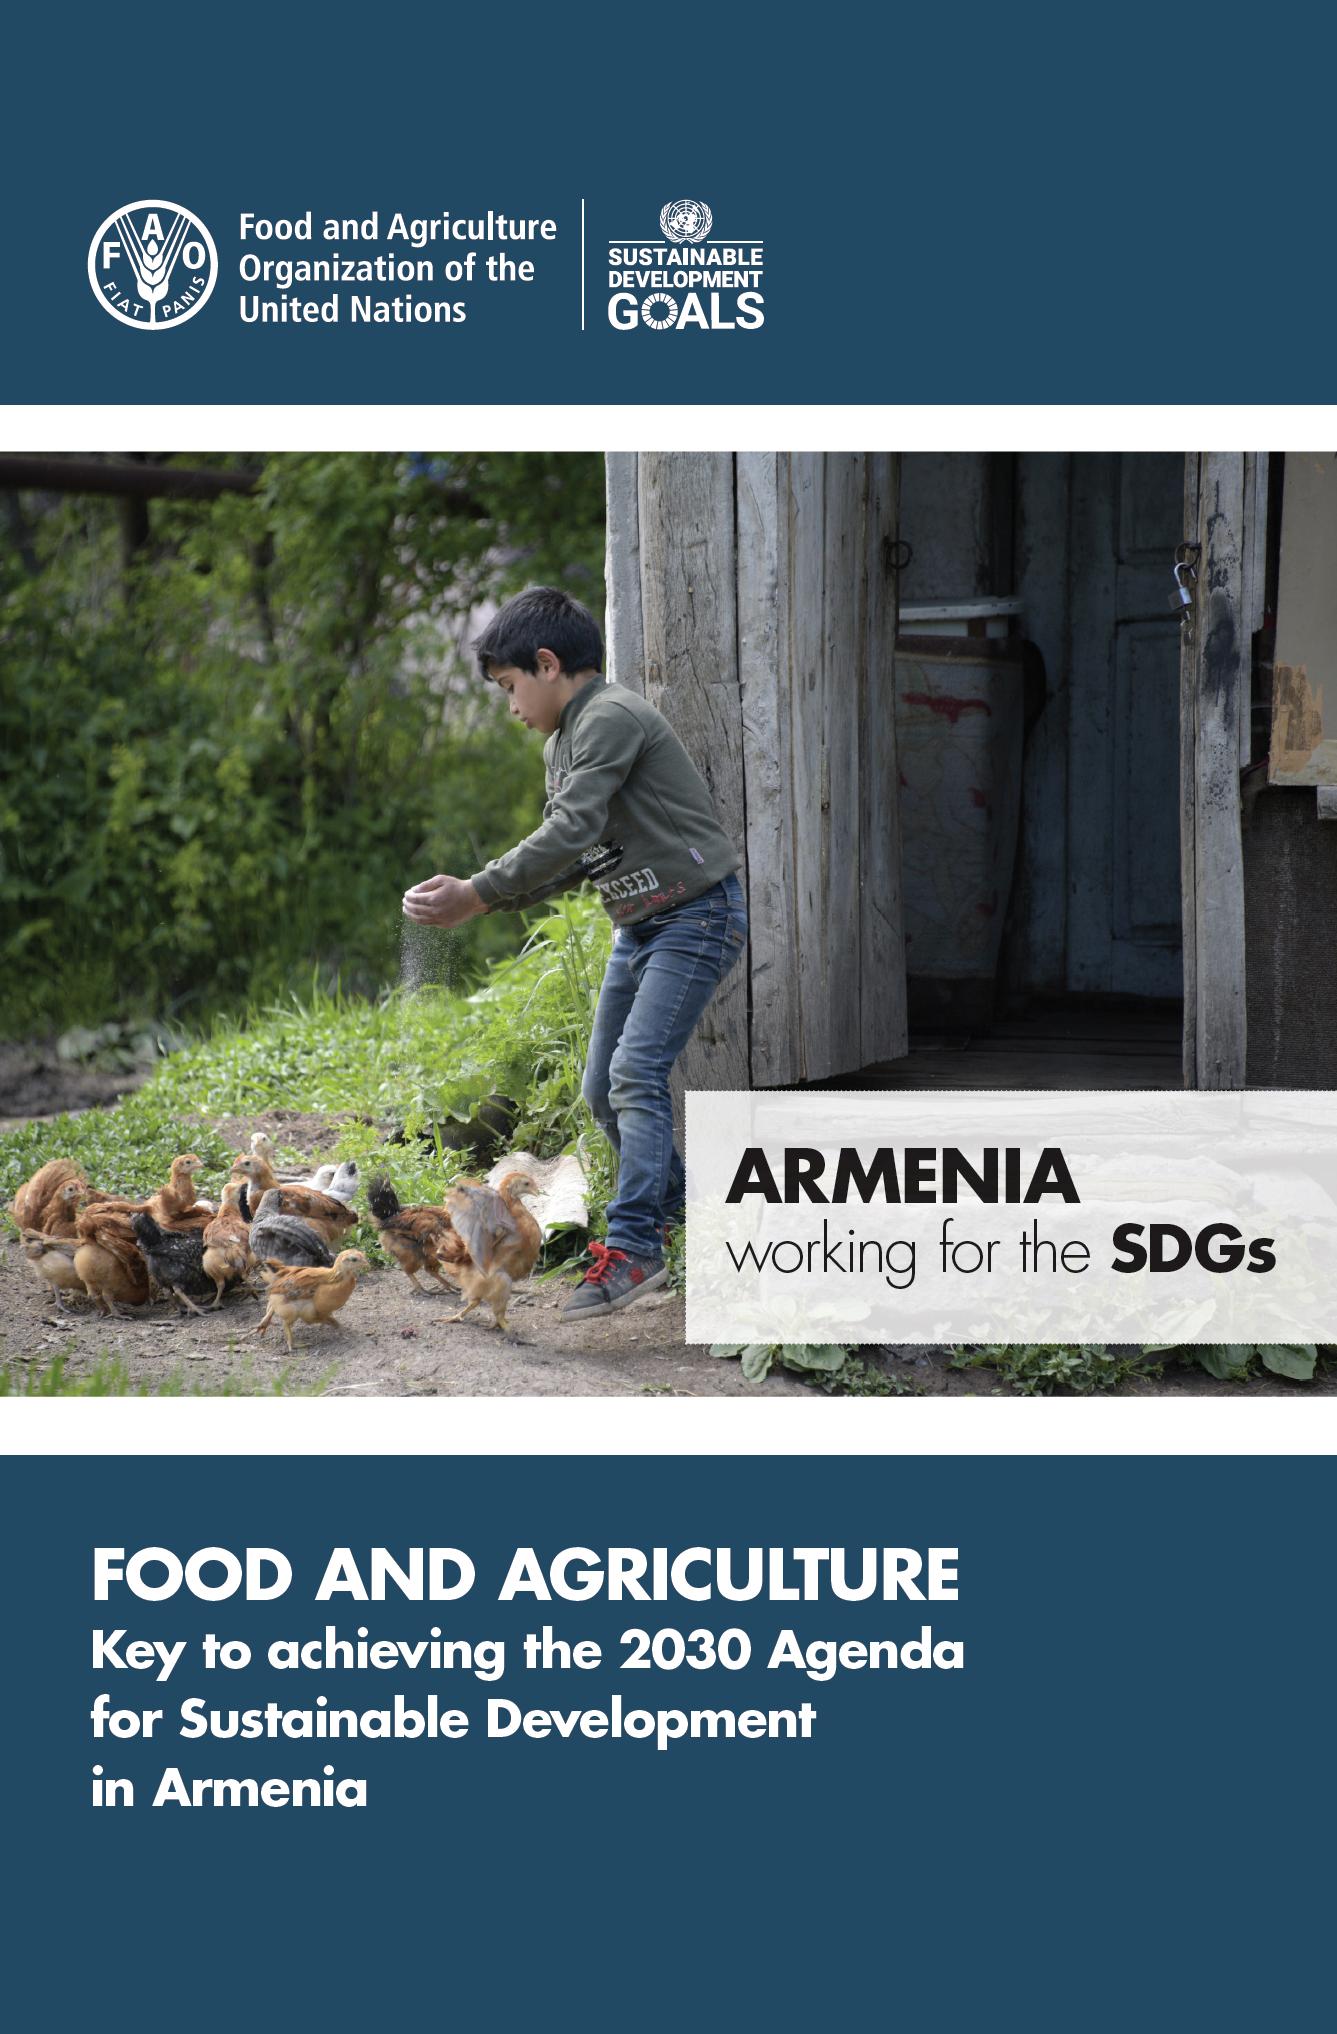 Armenia working for the SDGS brochure cover.